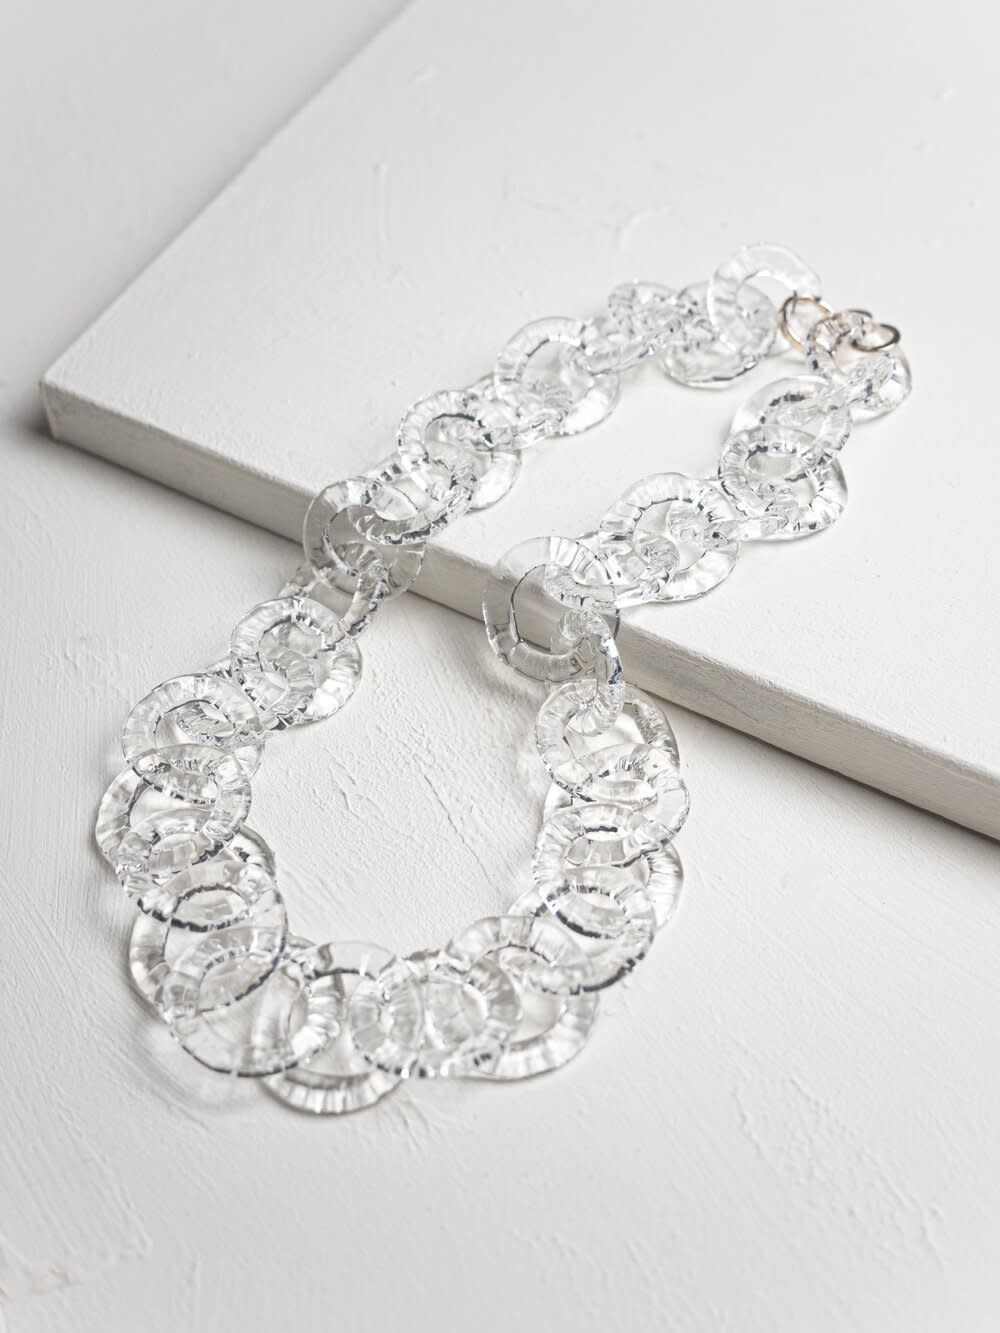 Minori Takagi Necklace - Chain Circle - Clear Glass